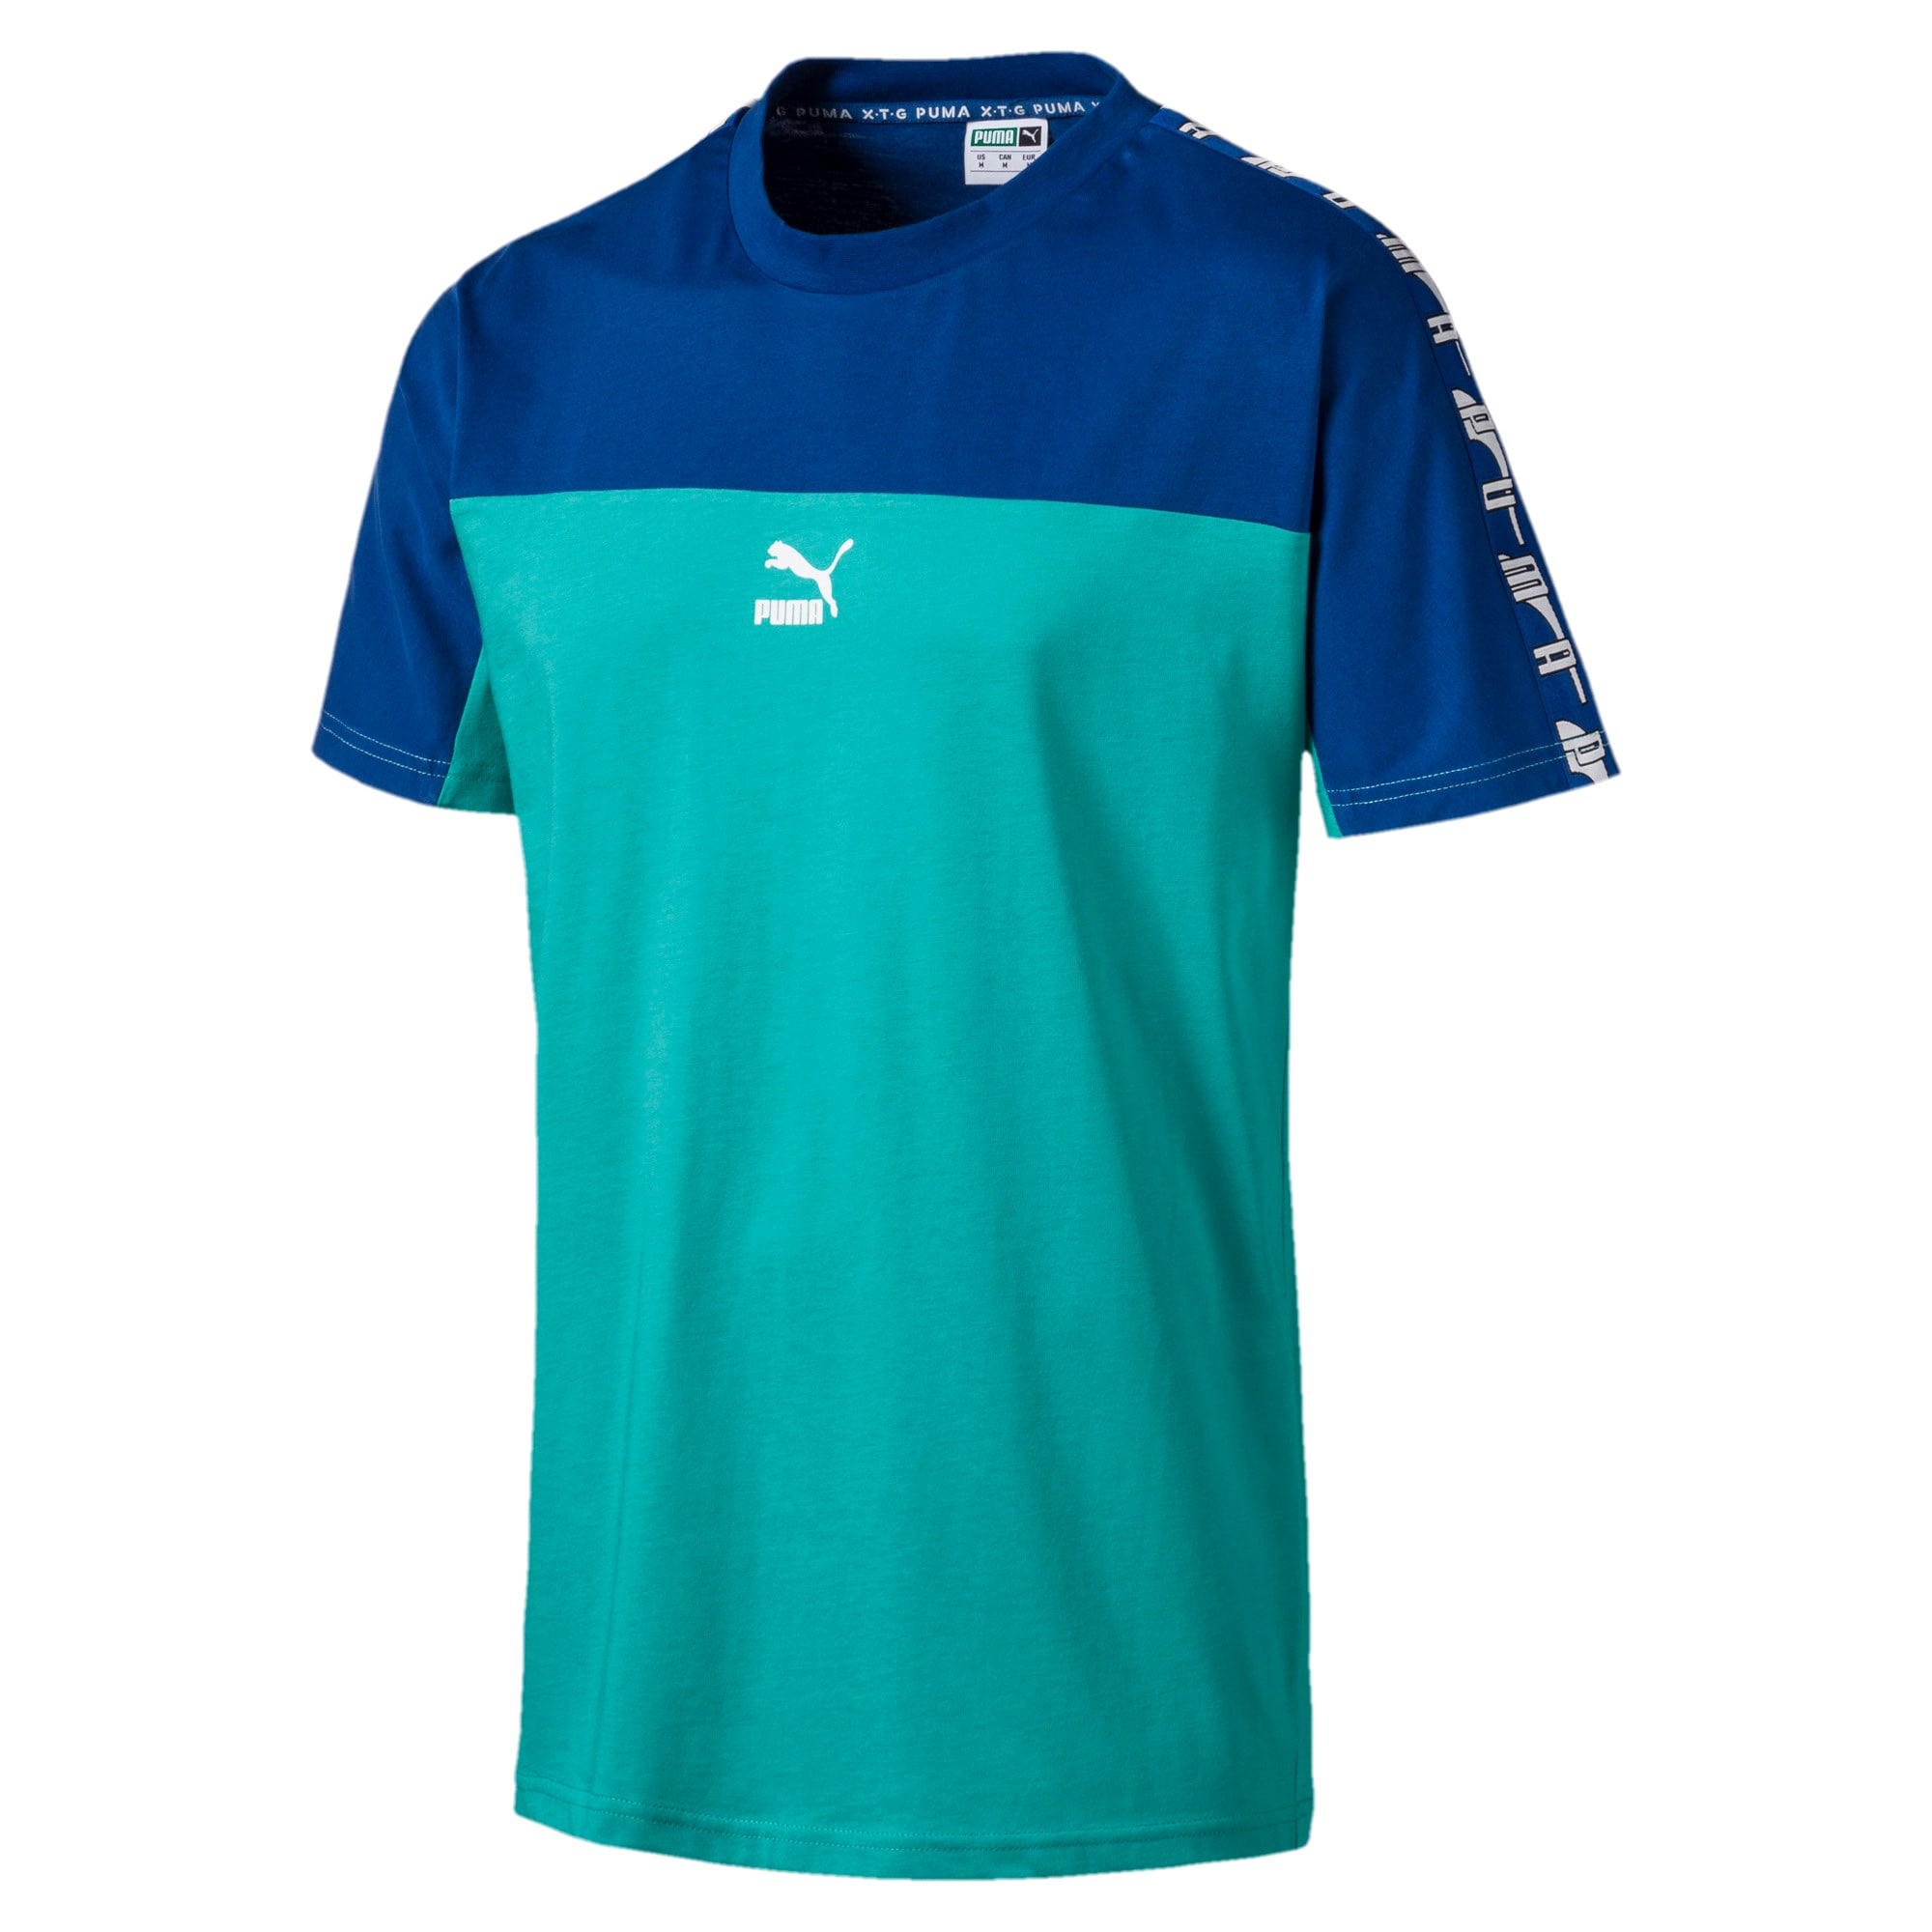 Thumbnail 1 of PUMA XTG SS Tシャツ 半袖, Blue Turquoise, medium-JPN